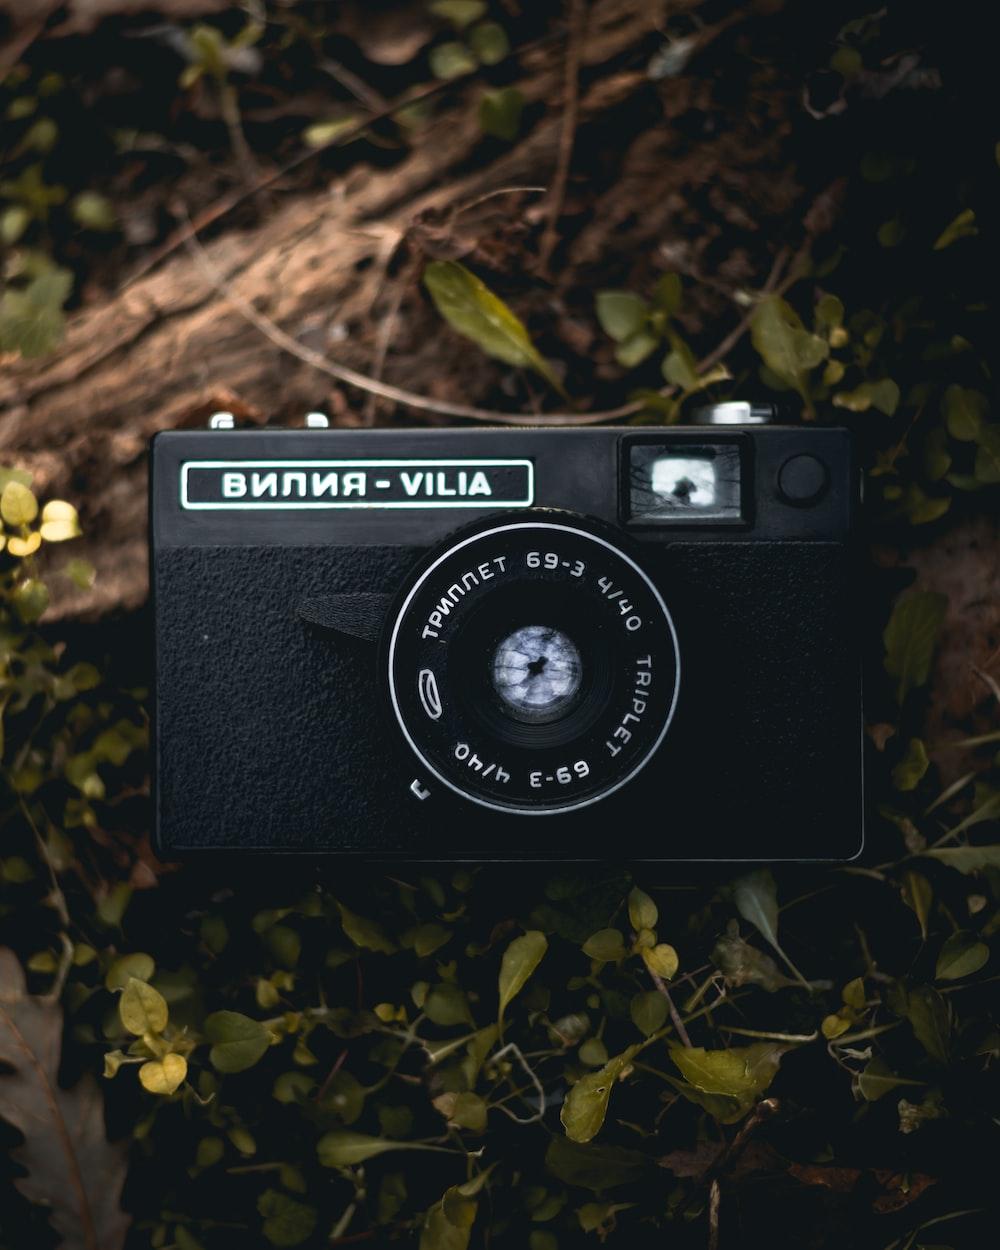 black and silver nikon camera on green grass